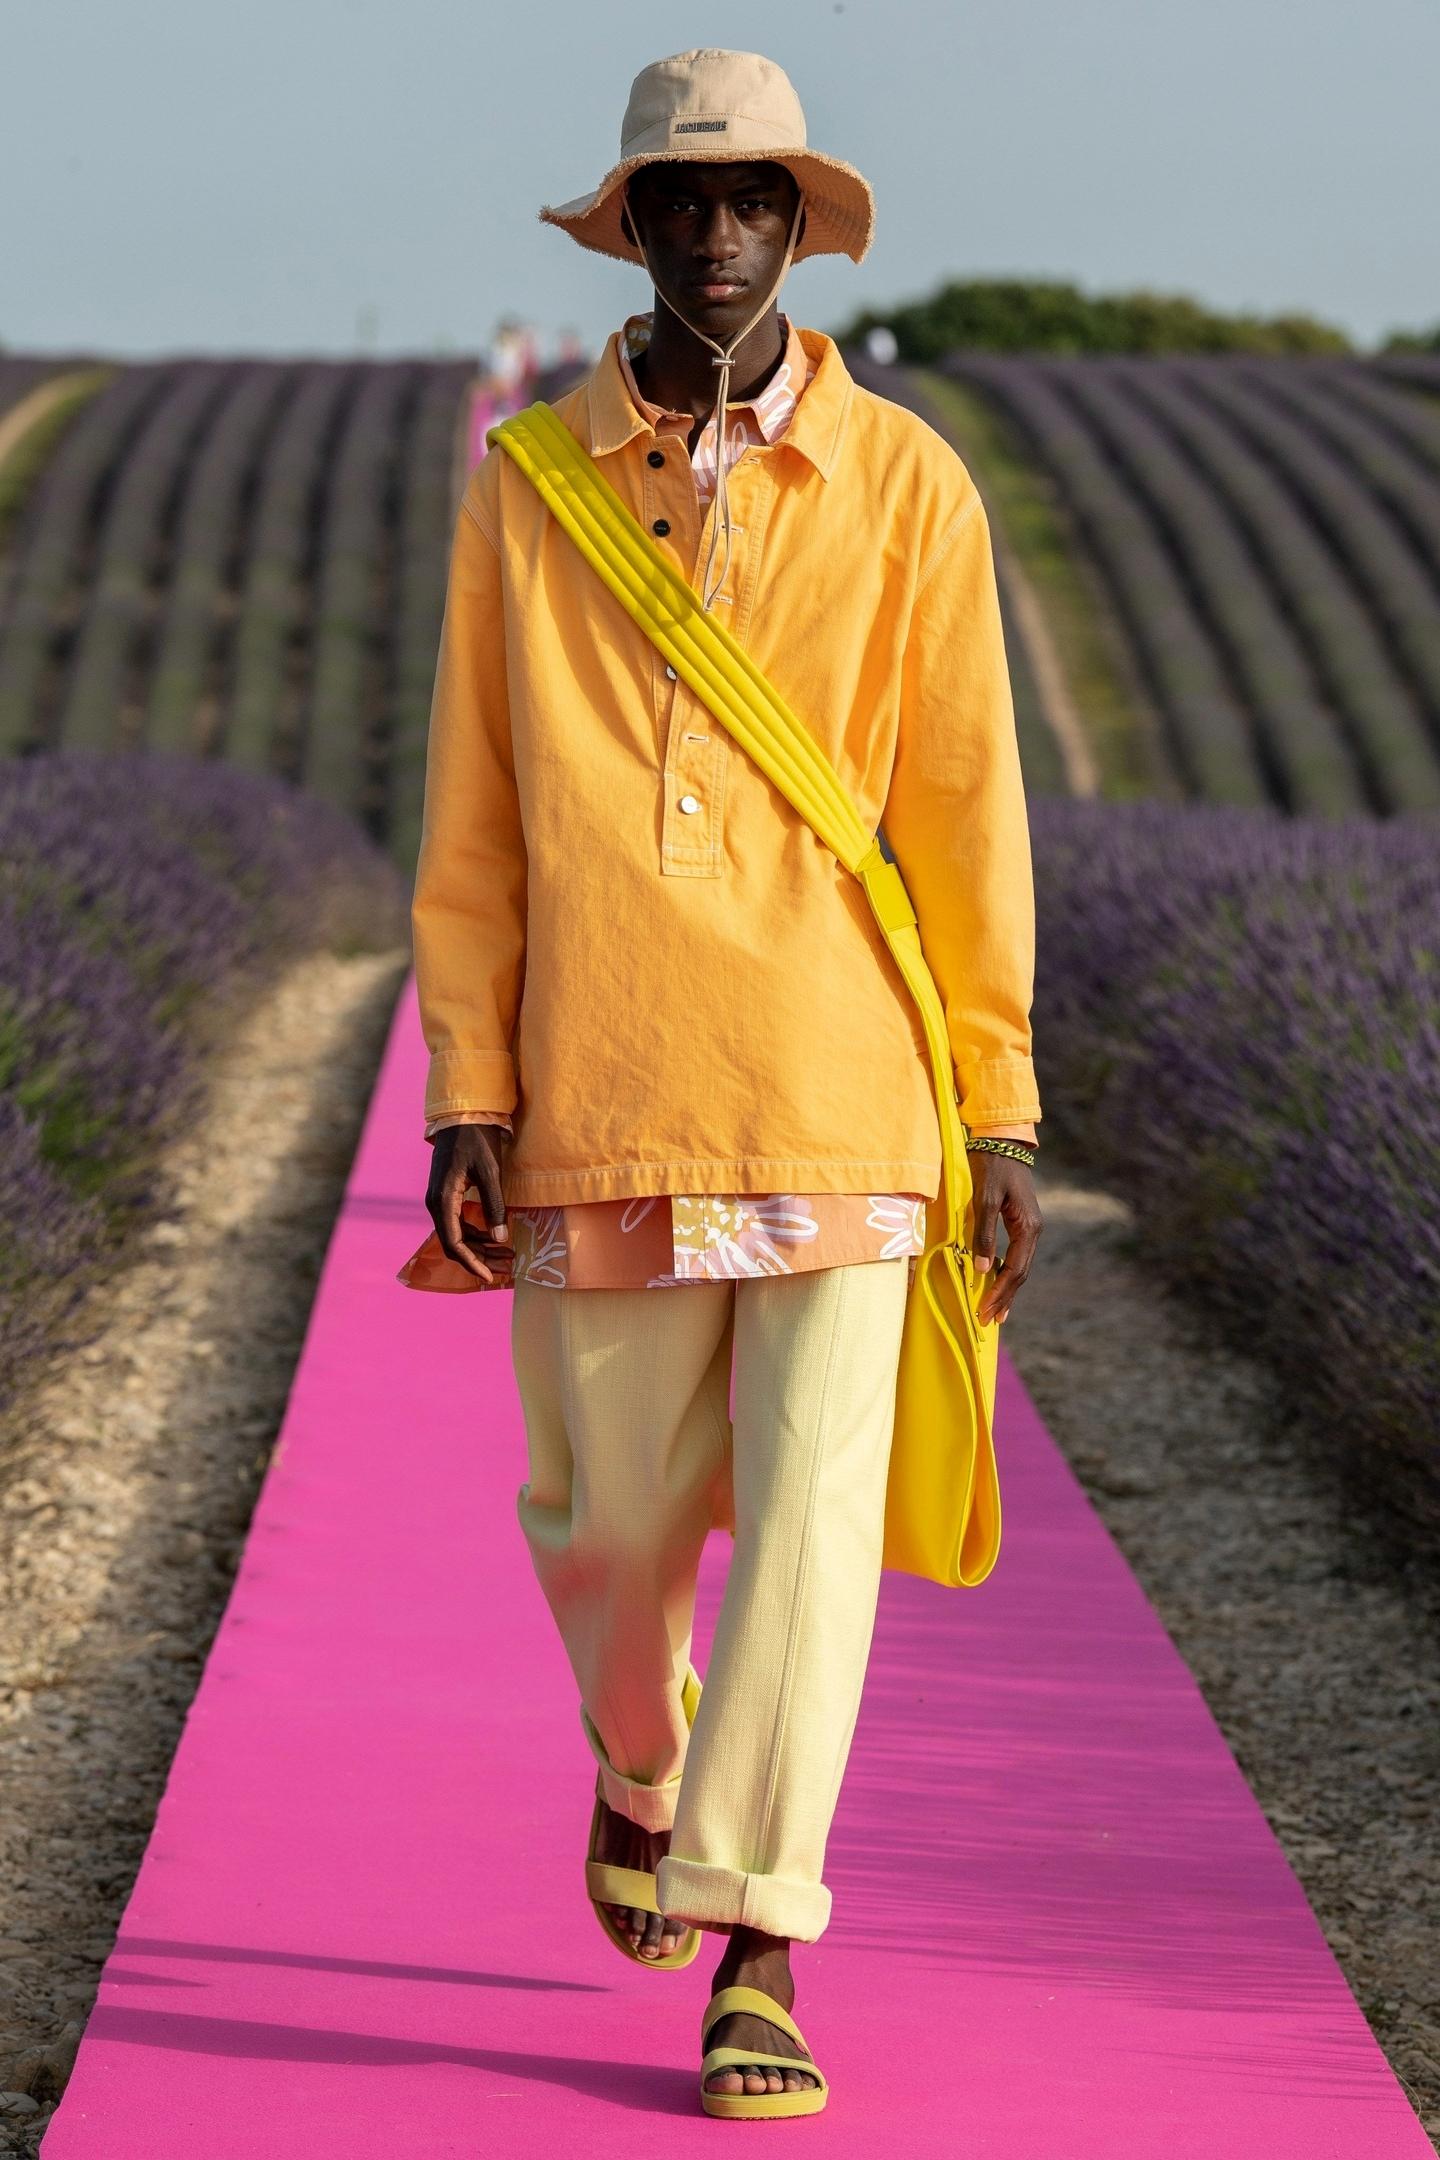 Образ из коллекции Jacquemus Spring/Summer 2020 Menswear